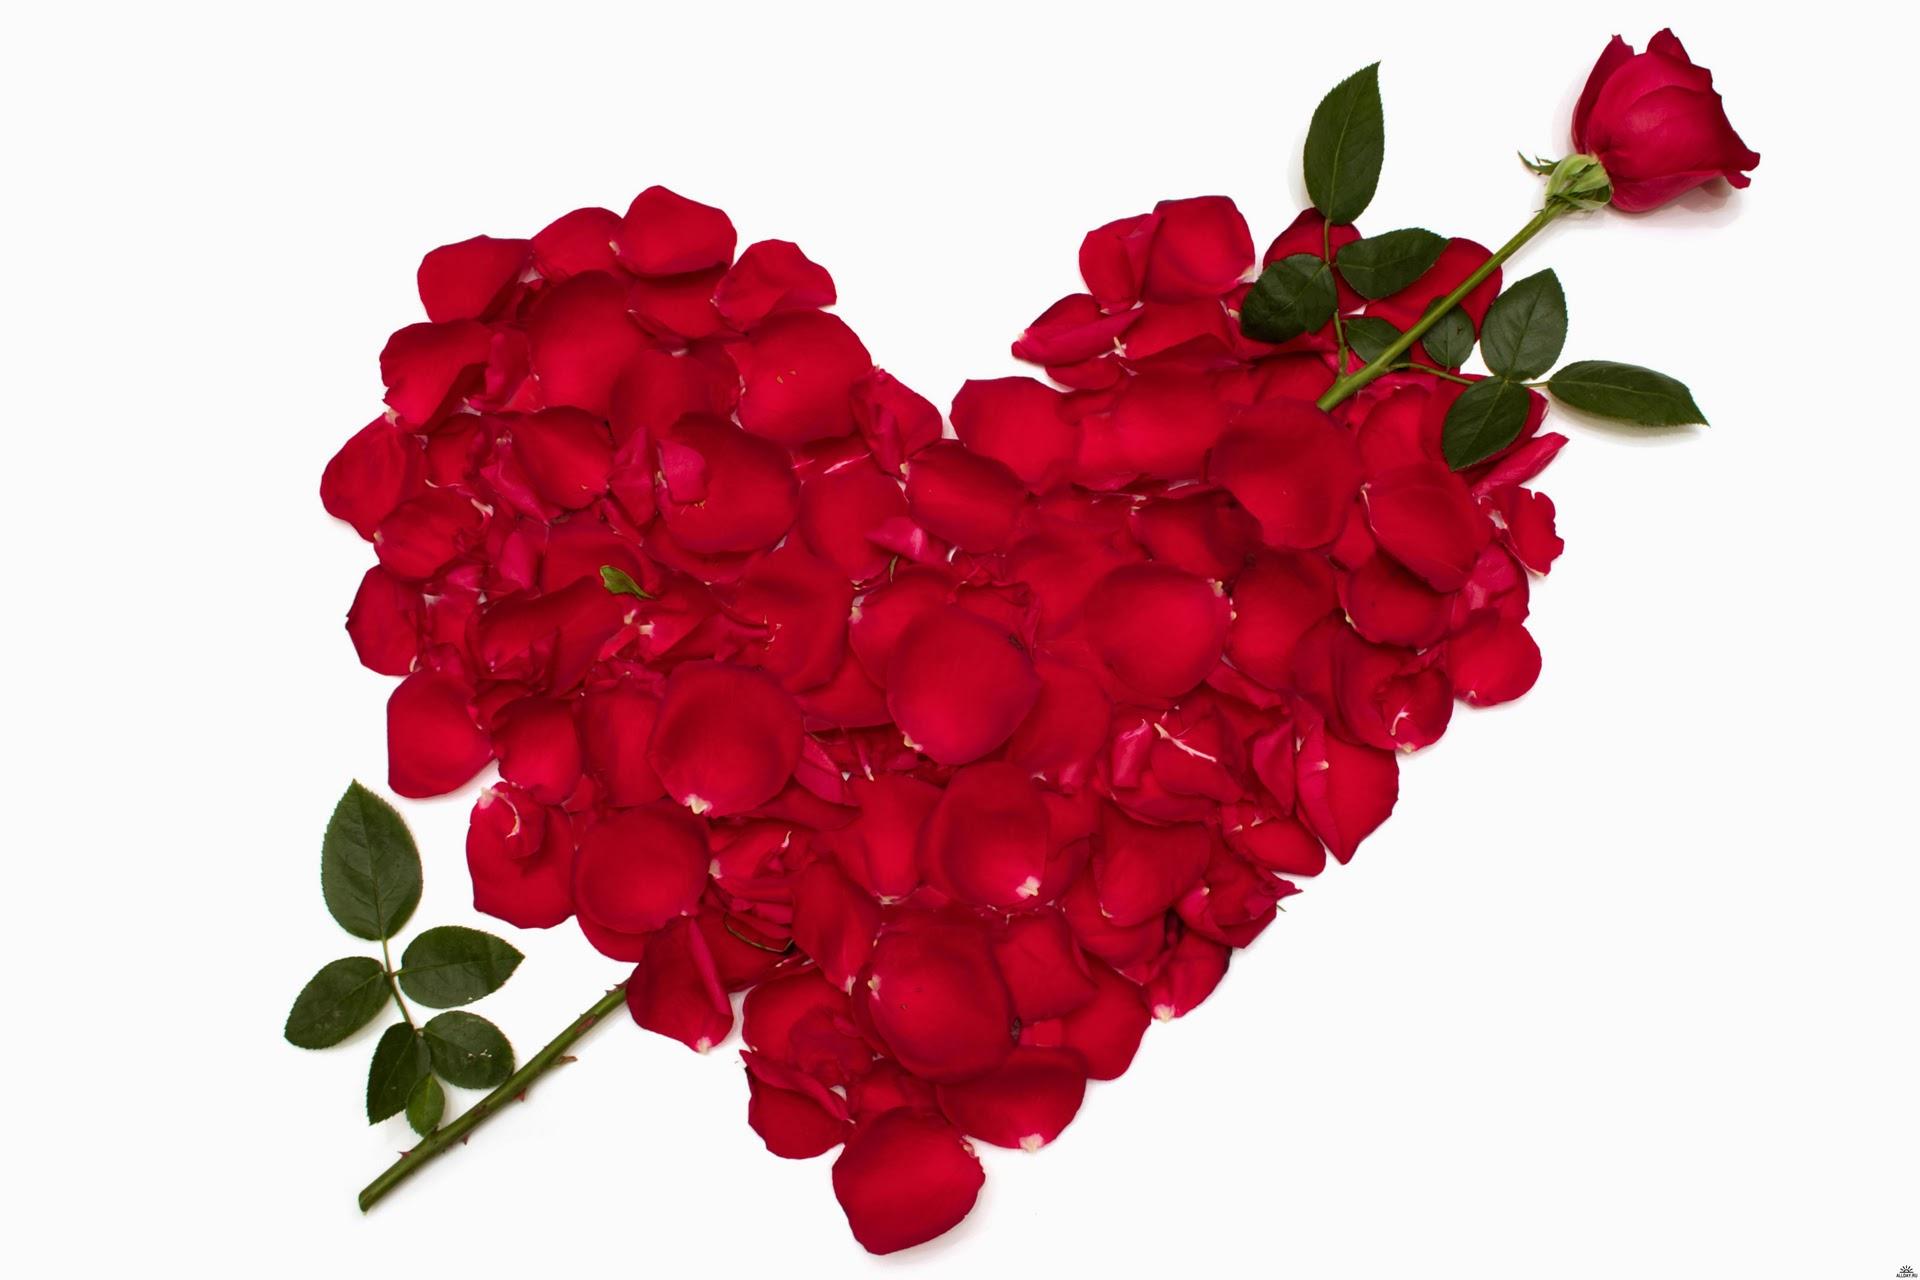 Rosas para san valentin Imagenes Romanticas para